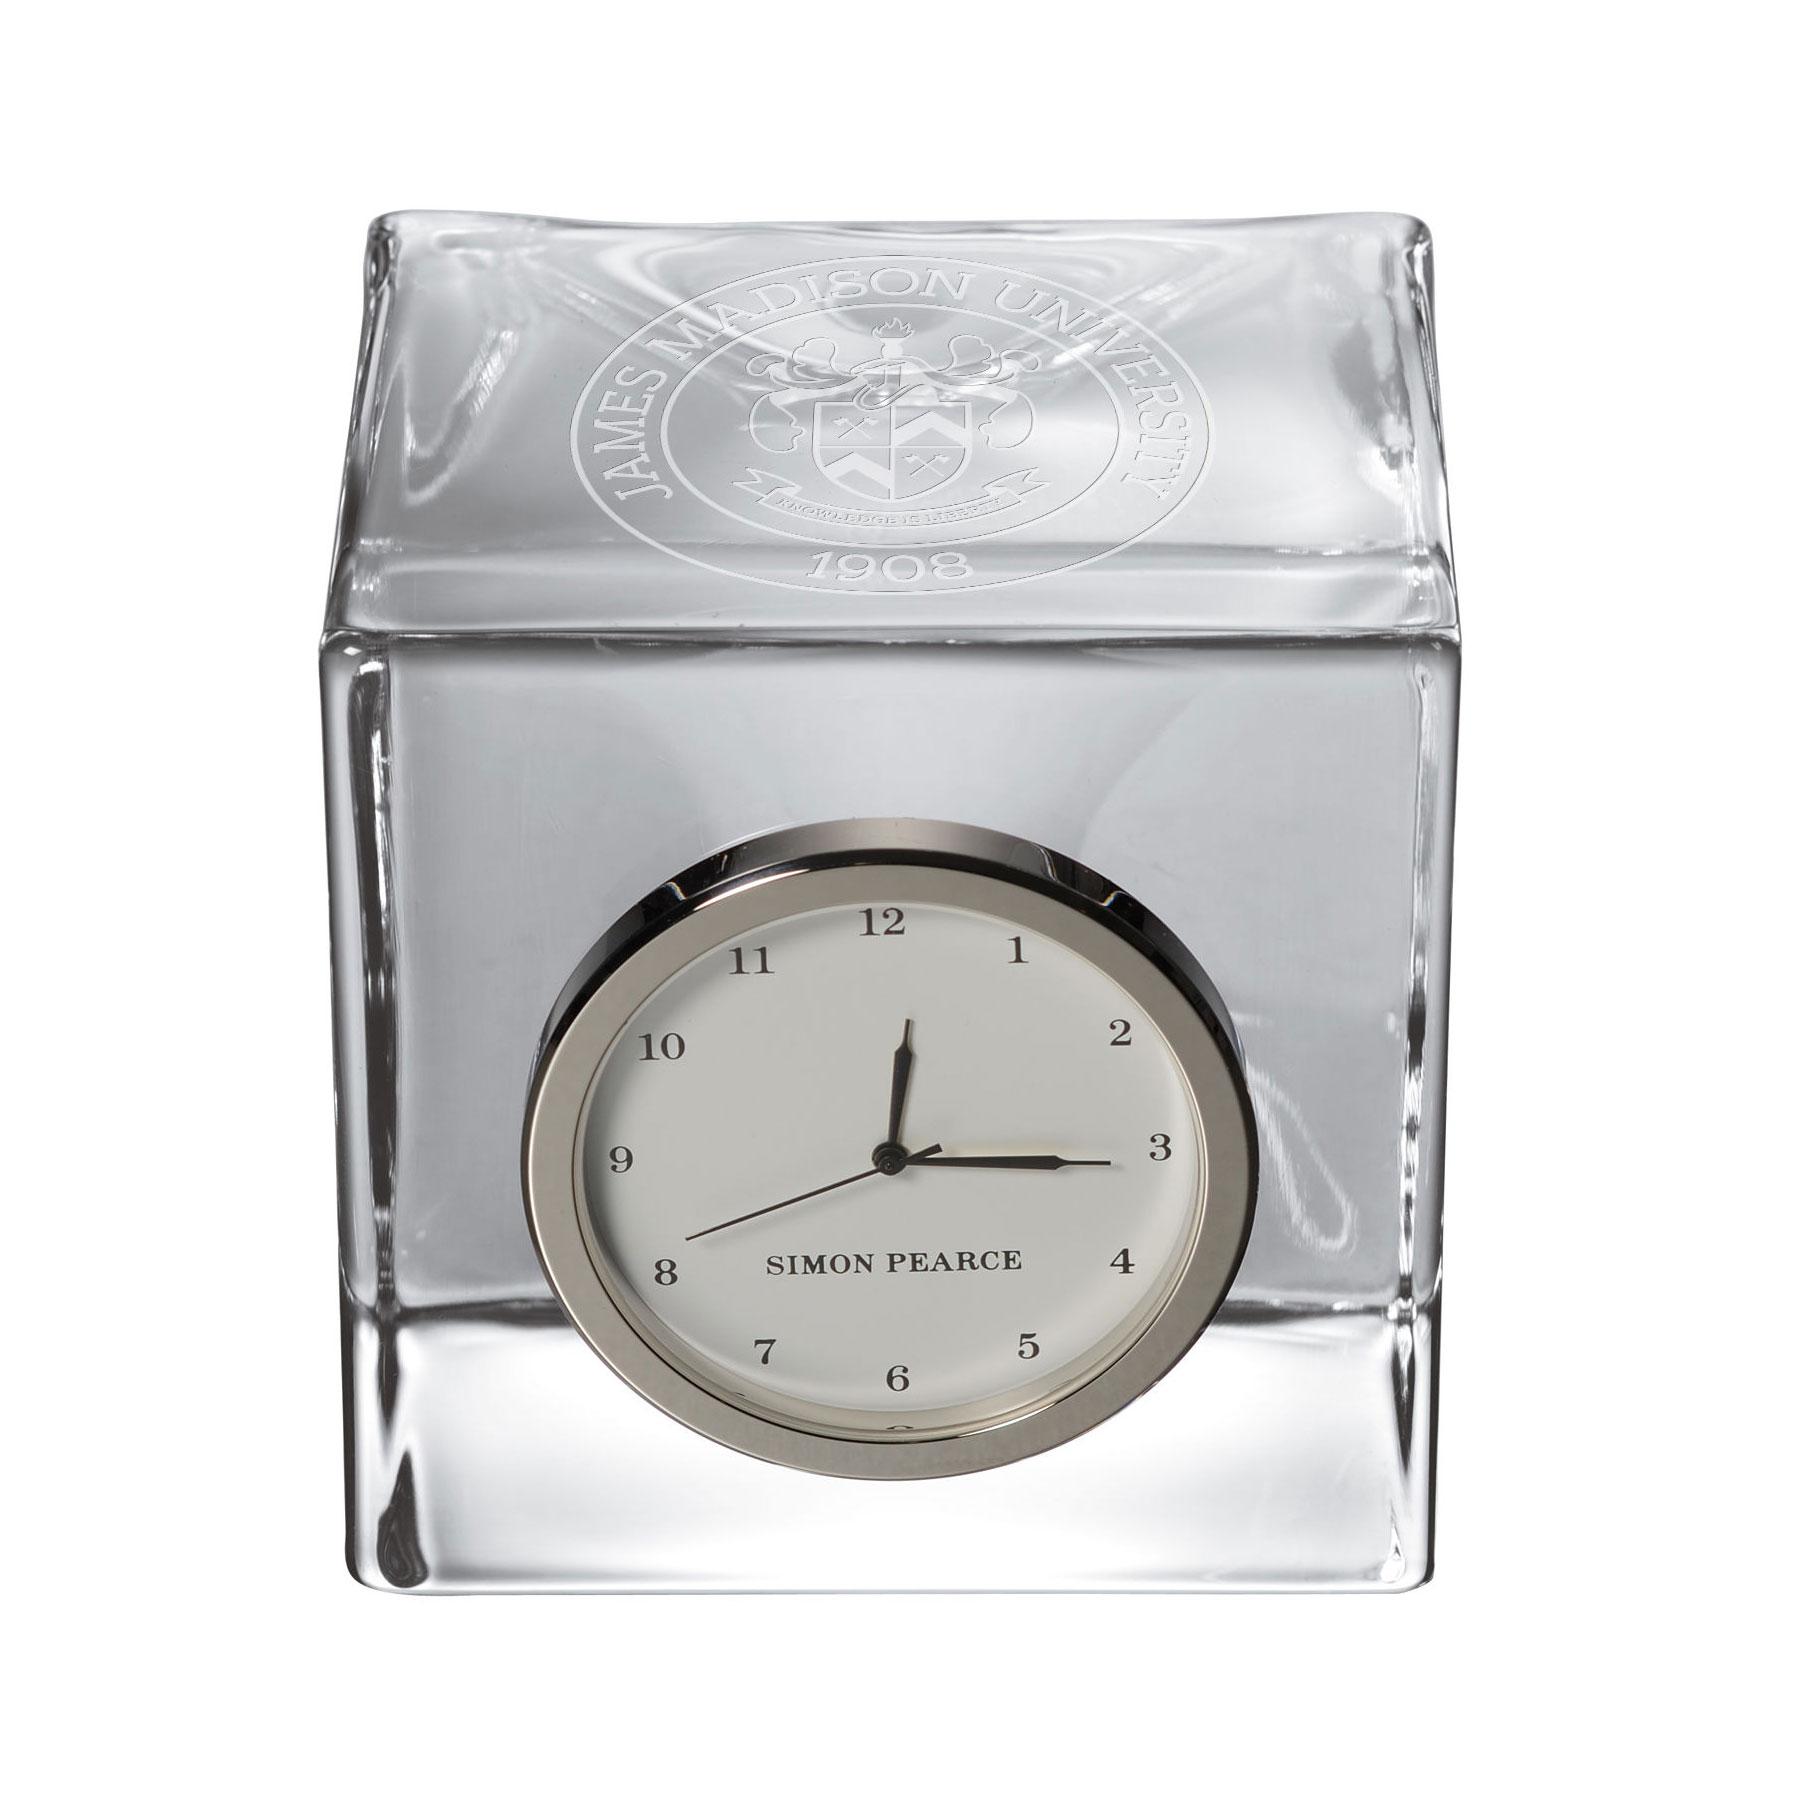 James Madison Glass Desk Clock by Simon Pearce